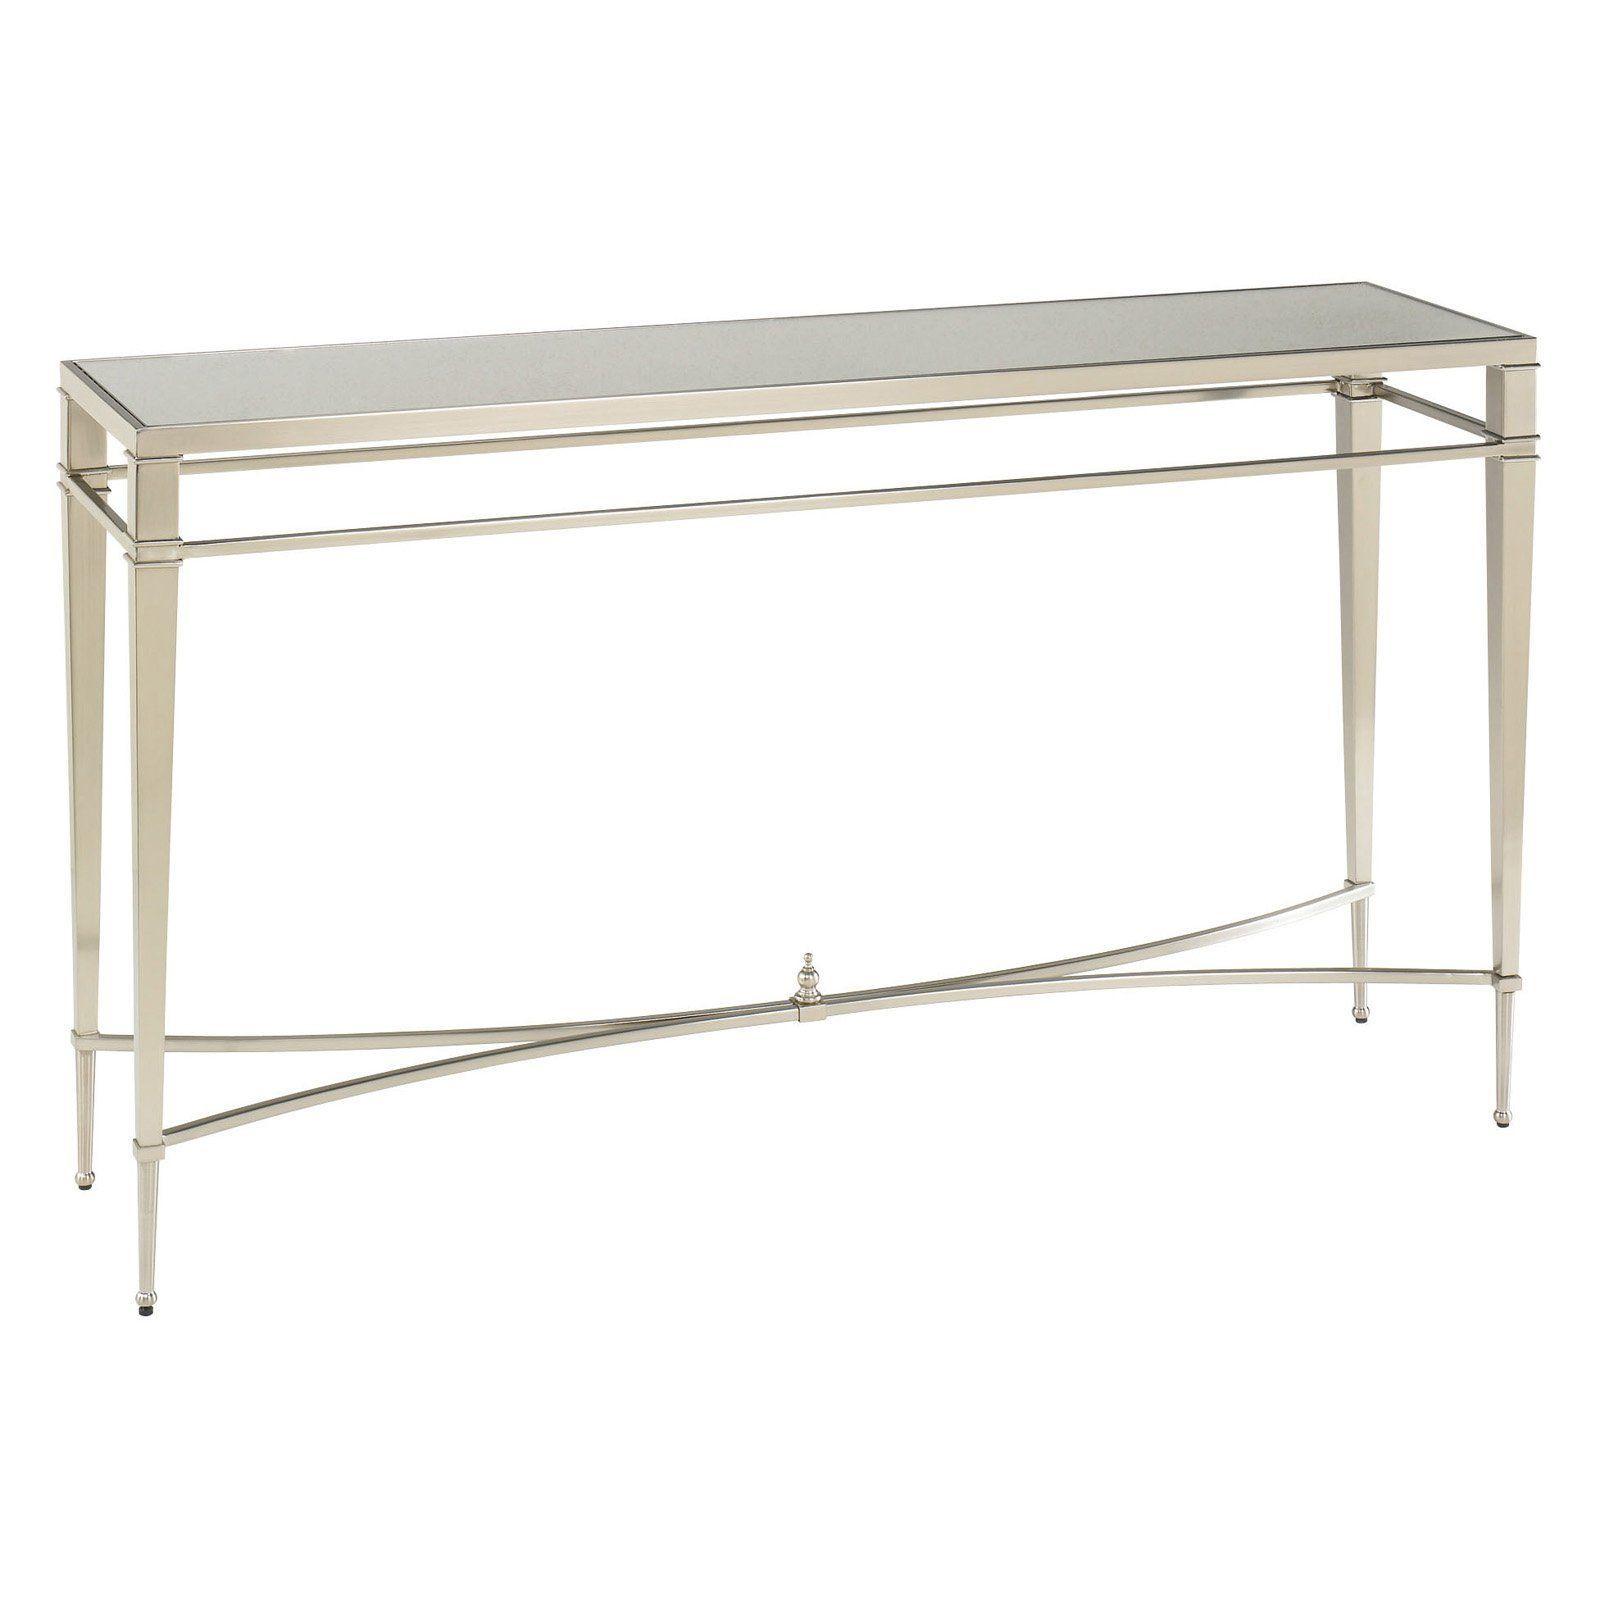 Hammary Mallory Rectangular Console table 173 925